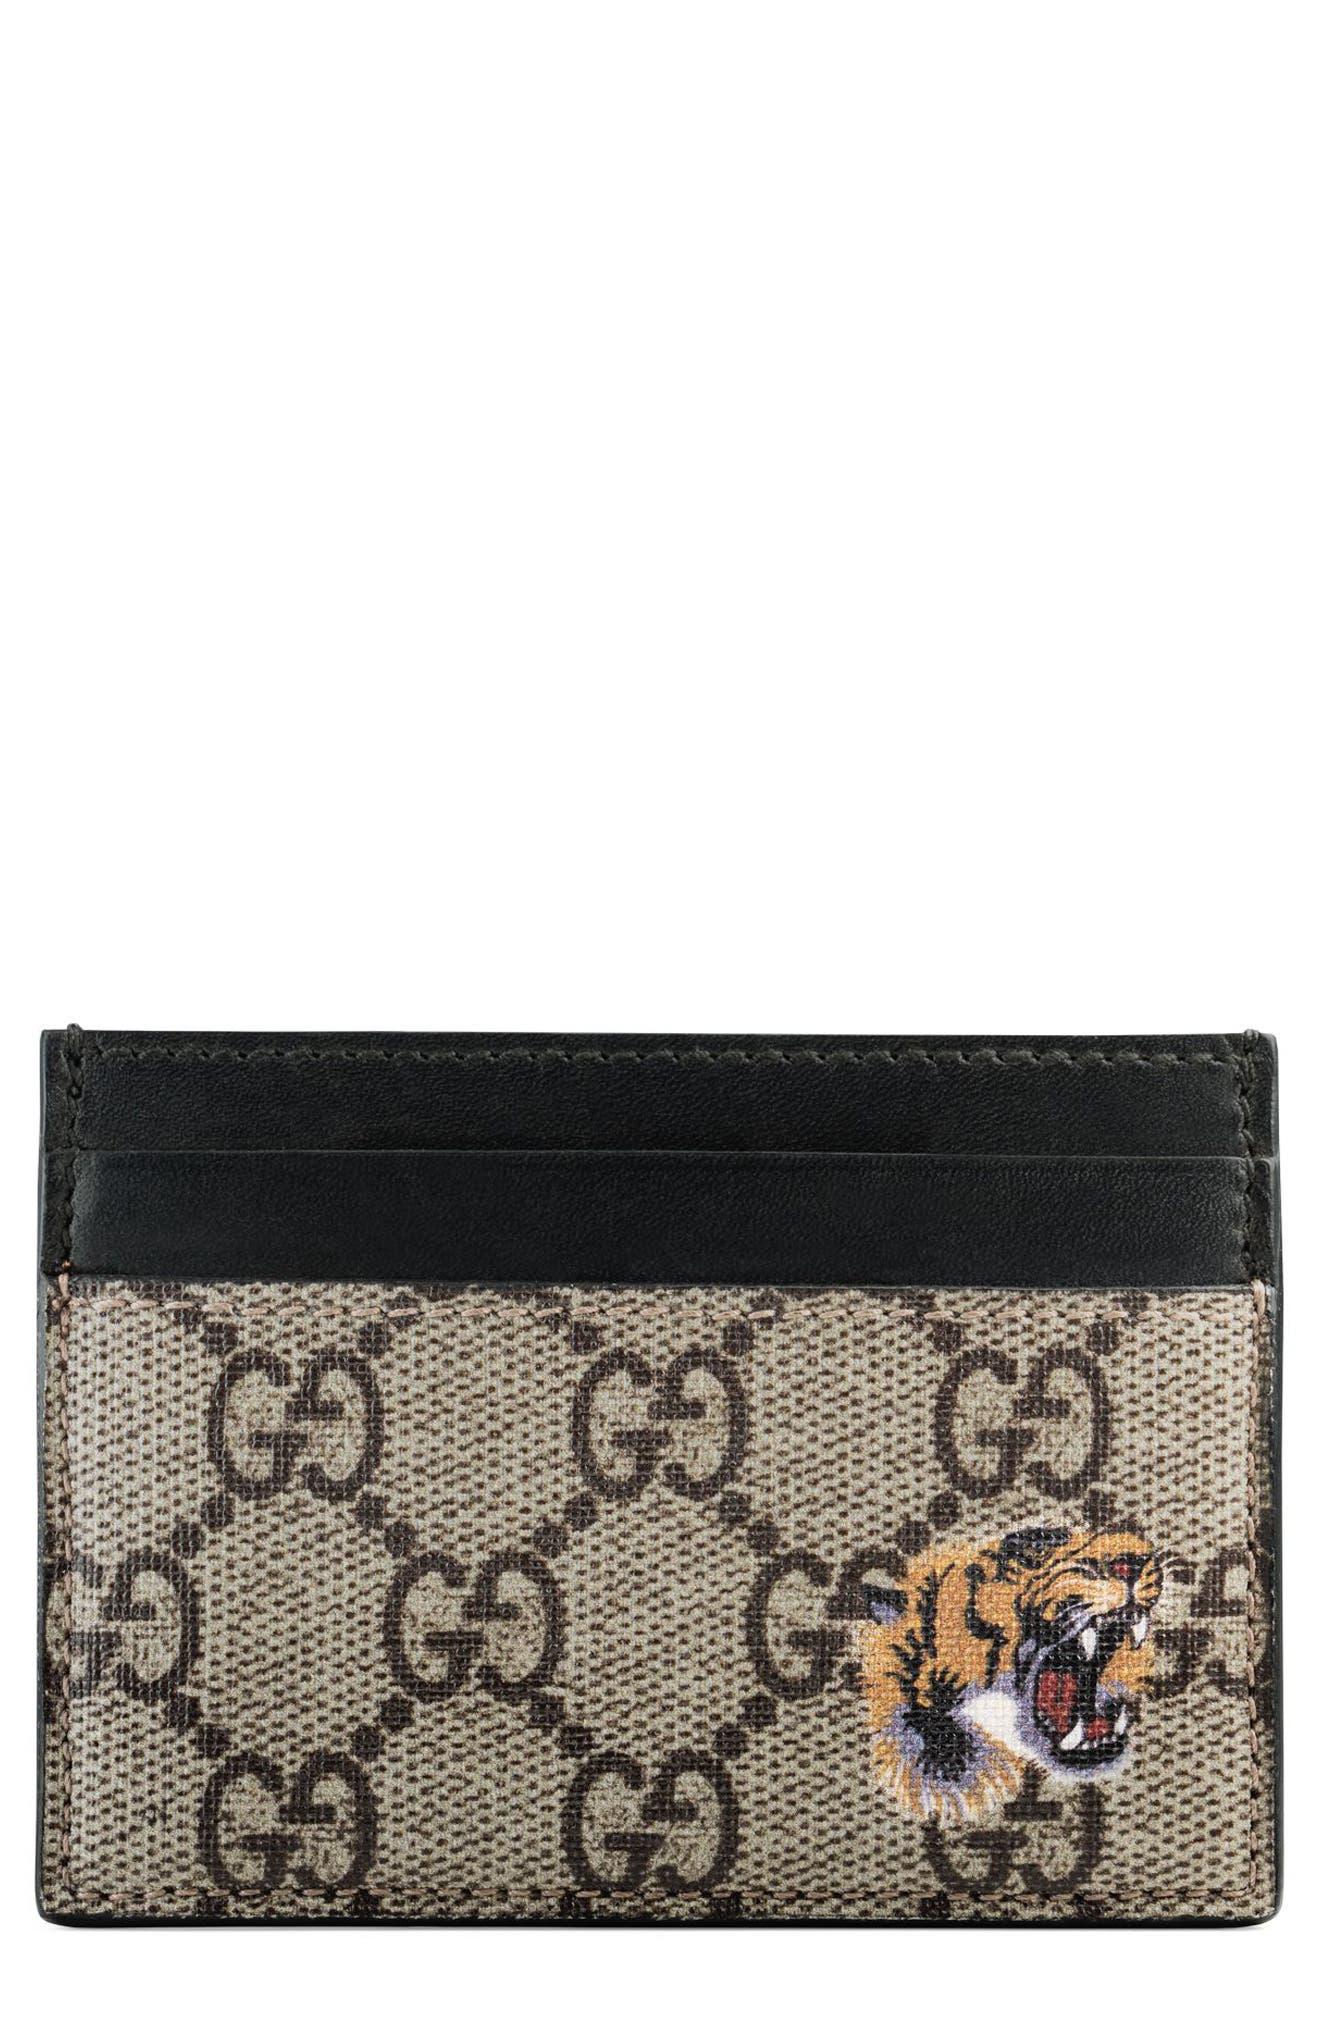 Gucci Logo Card Case